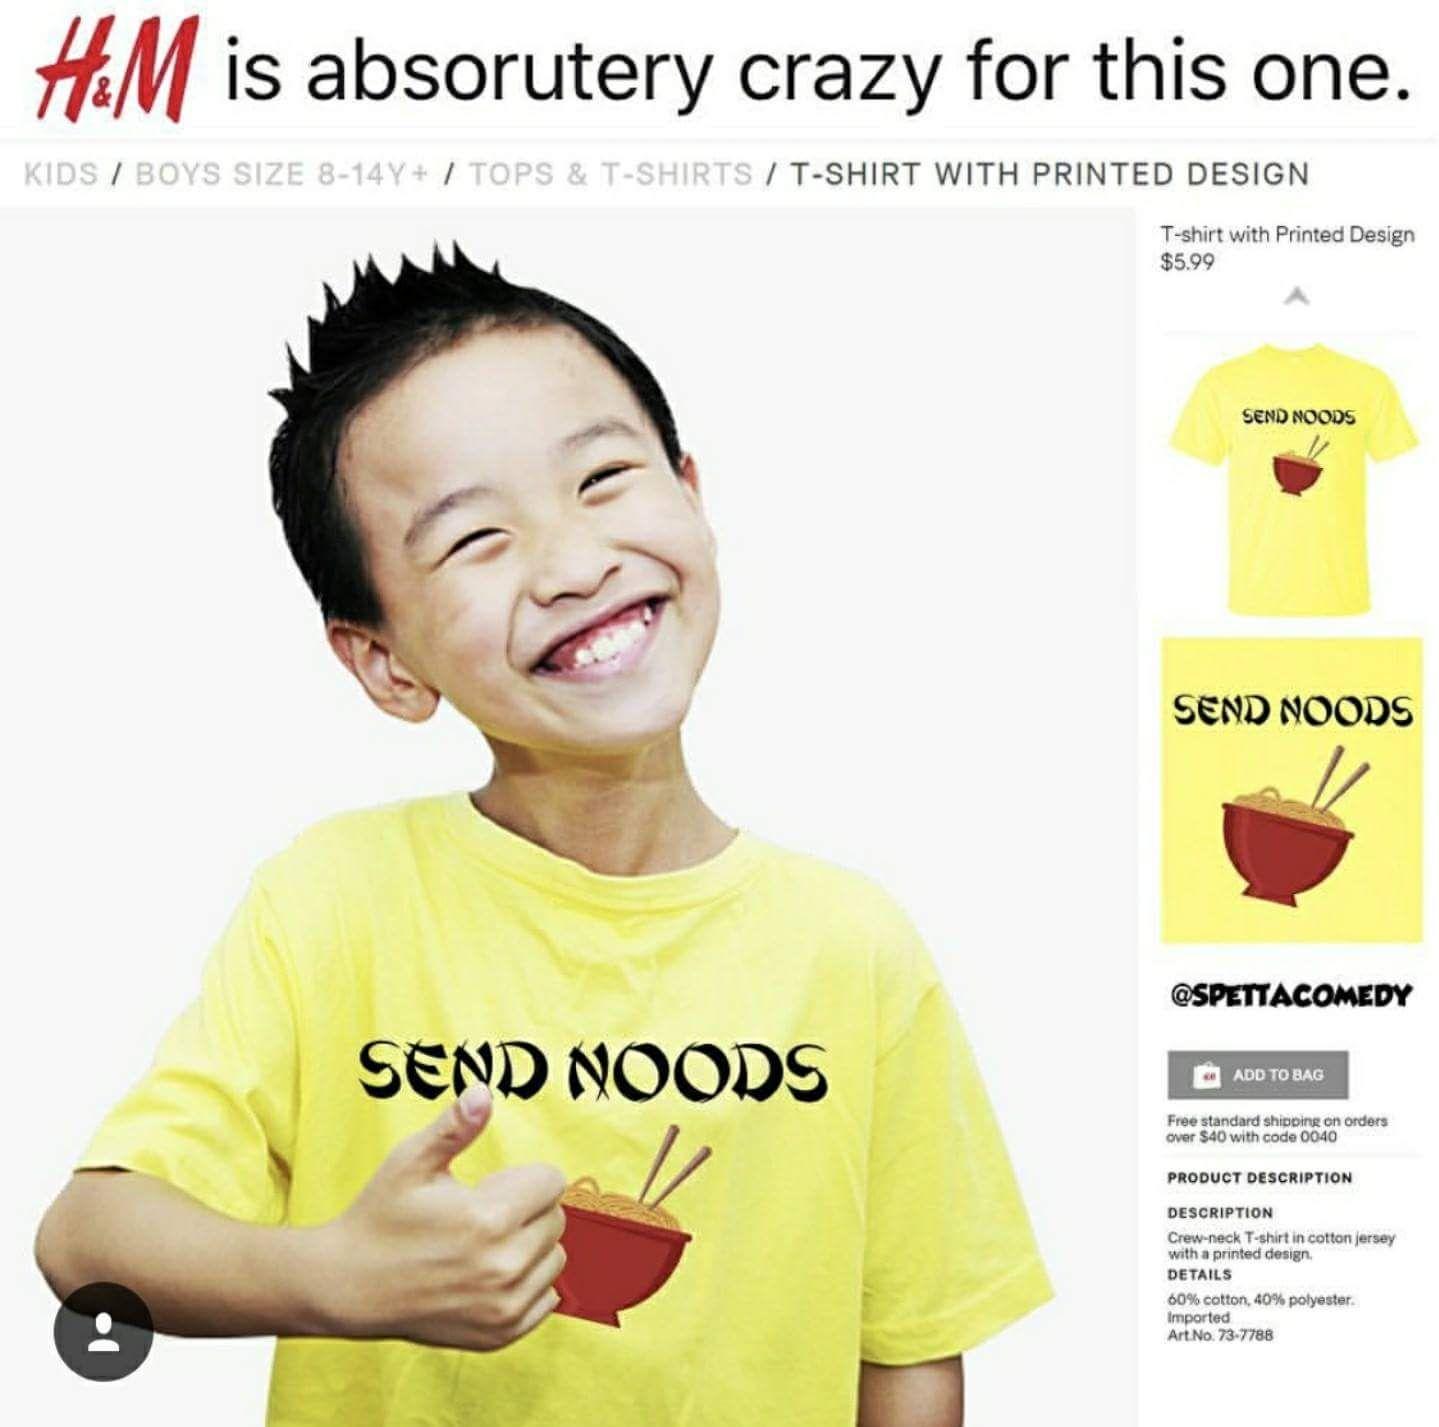 Send noods!